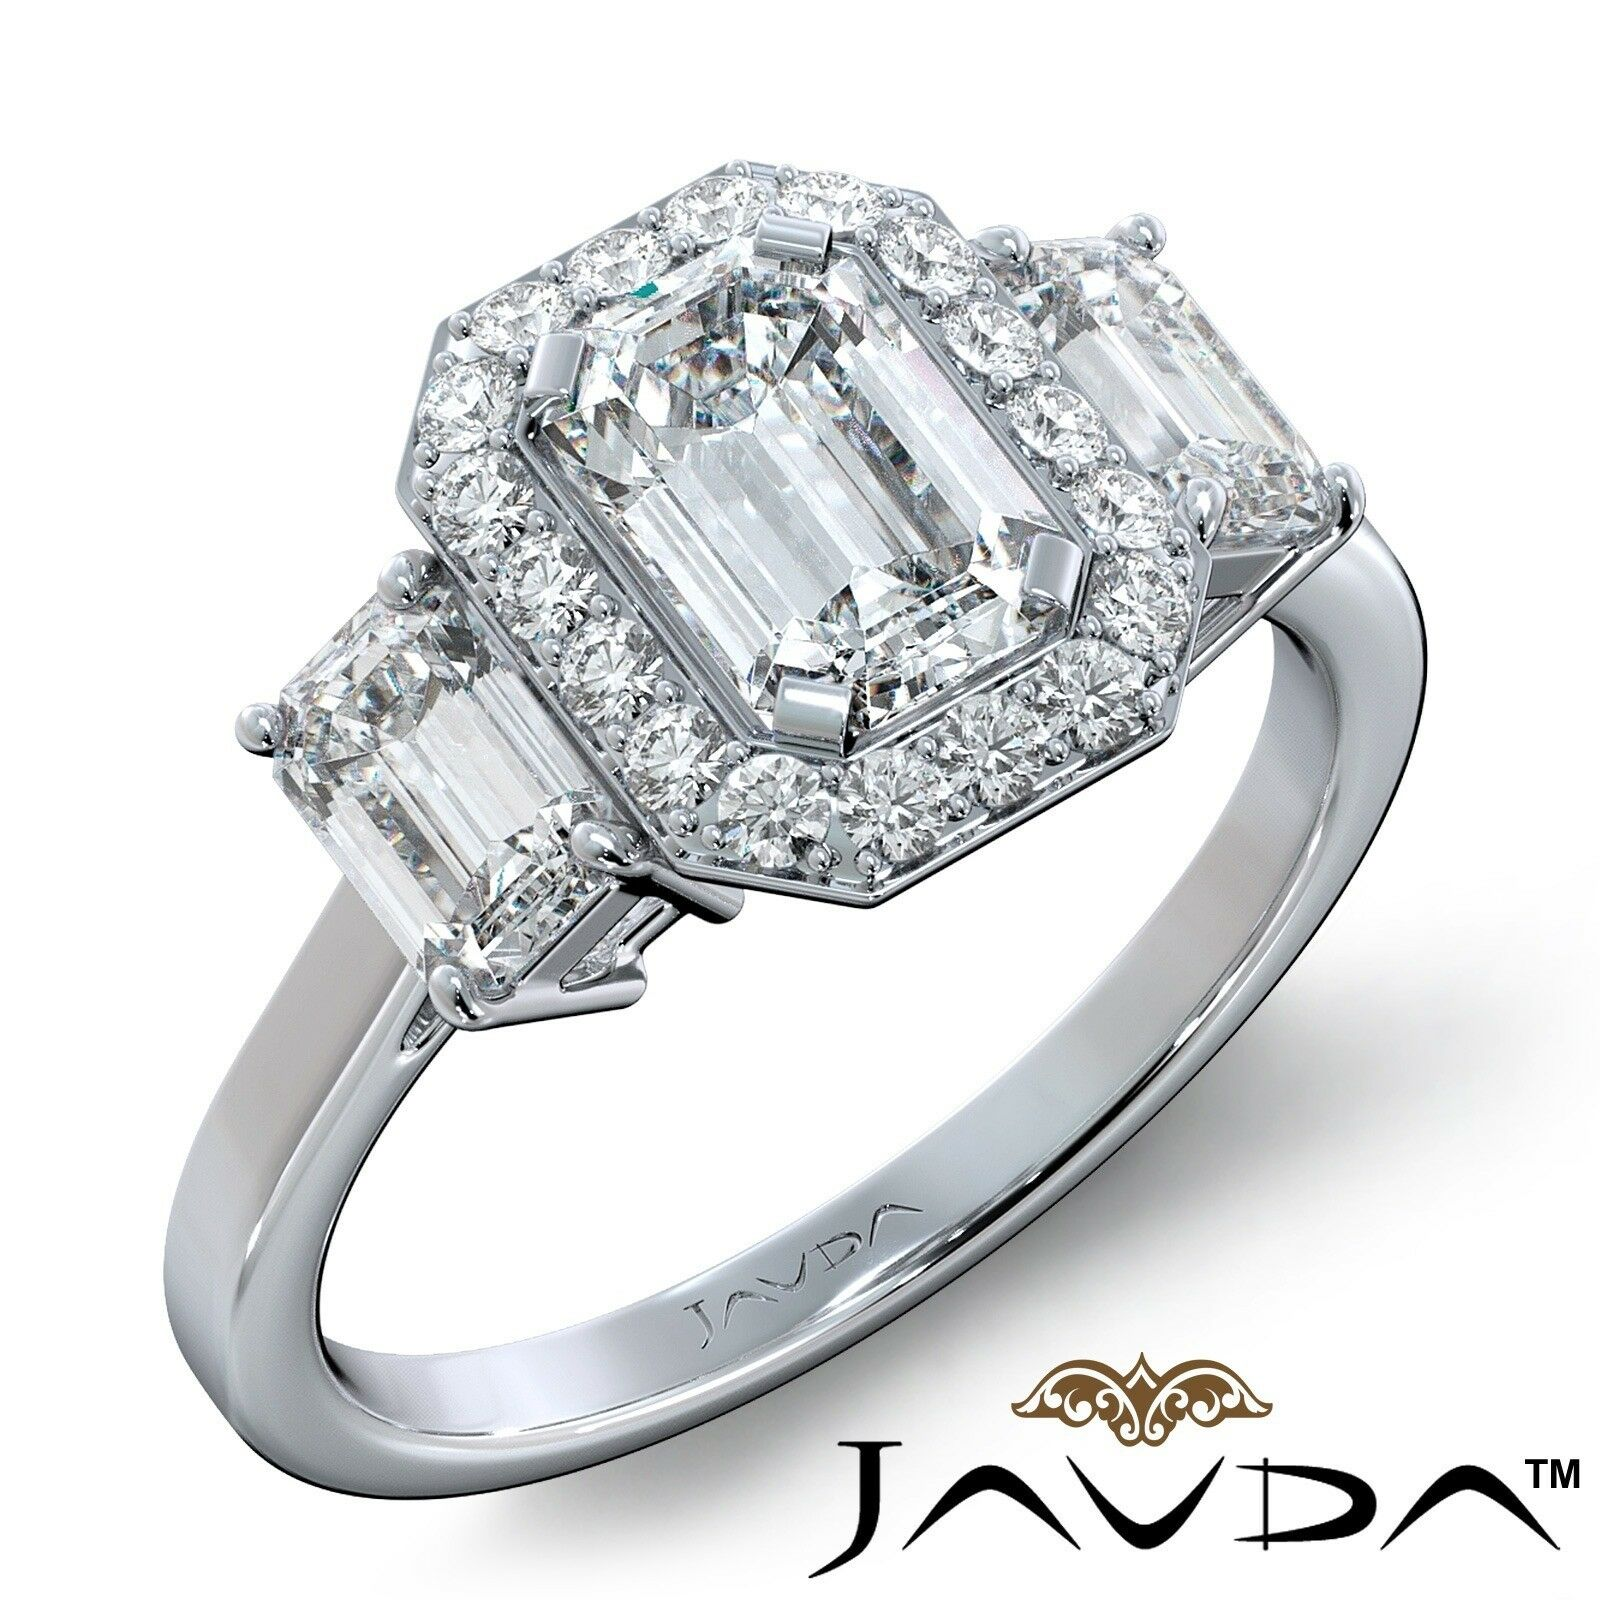 1.55ctw 3 Stone Halo Pave Emerald Diamond Engagement Ring GIA F-SI2 White Gold